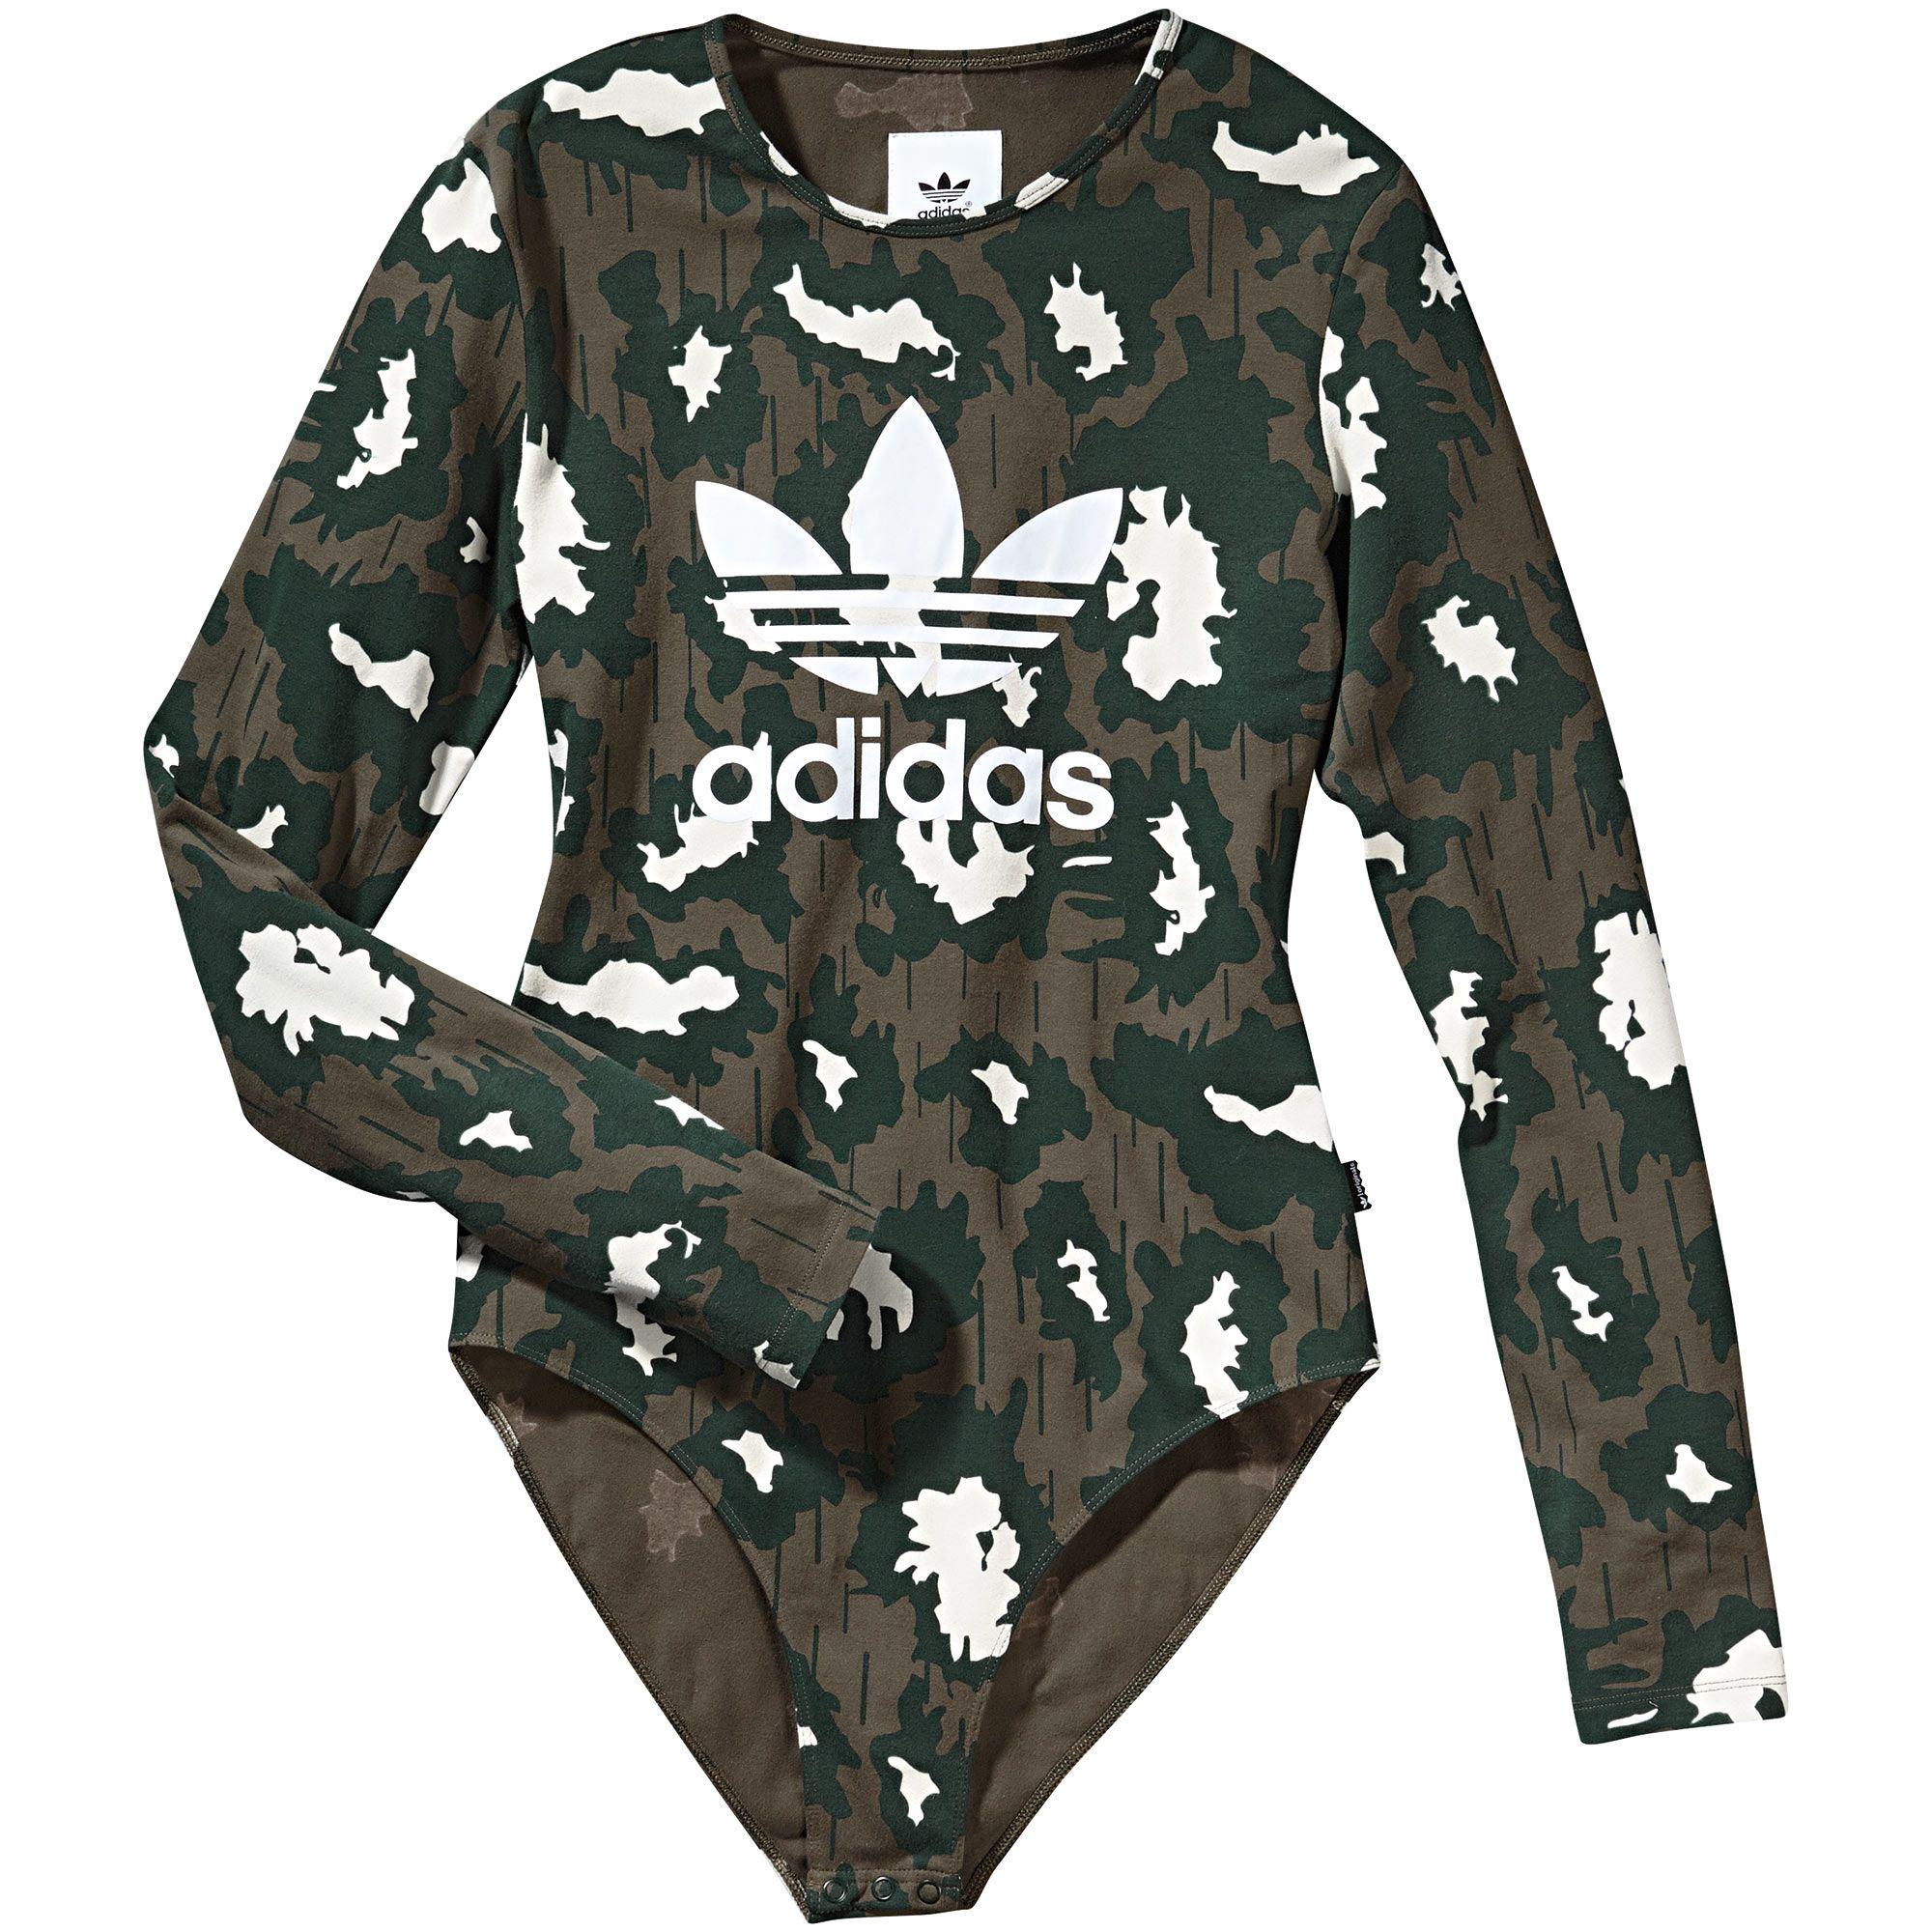 Adidas Camo Bodysuit Adidas Uk Adidas Camo Bodysuit Adidas Camouflage [ 2000 x 2000 Pixel ]